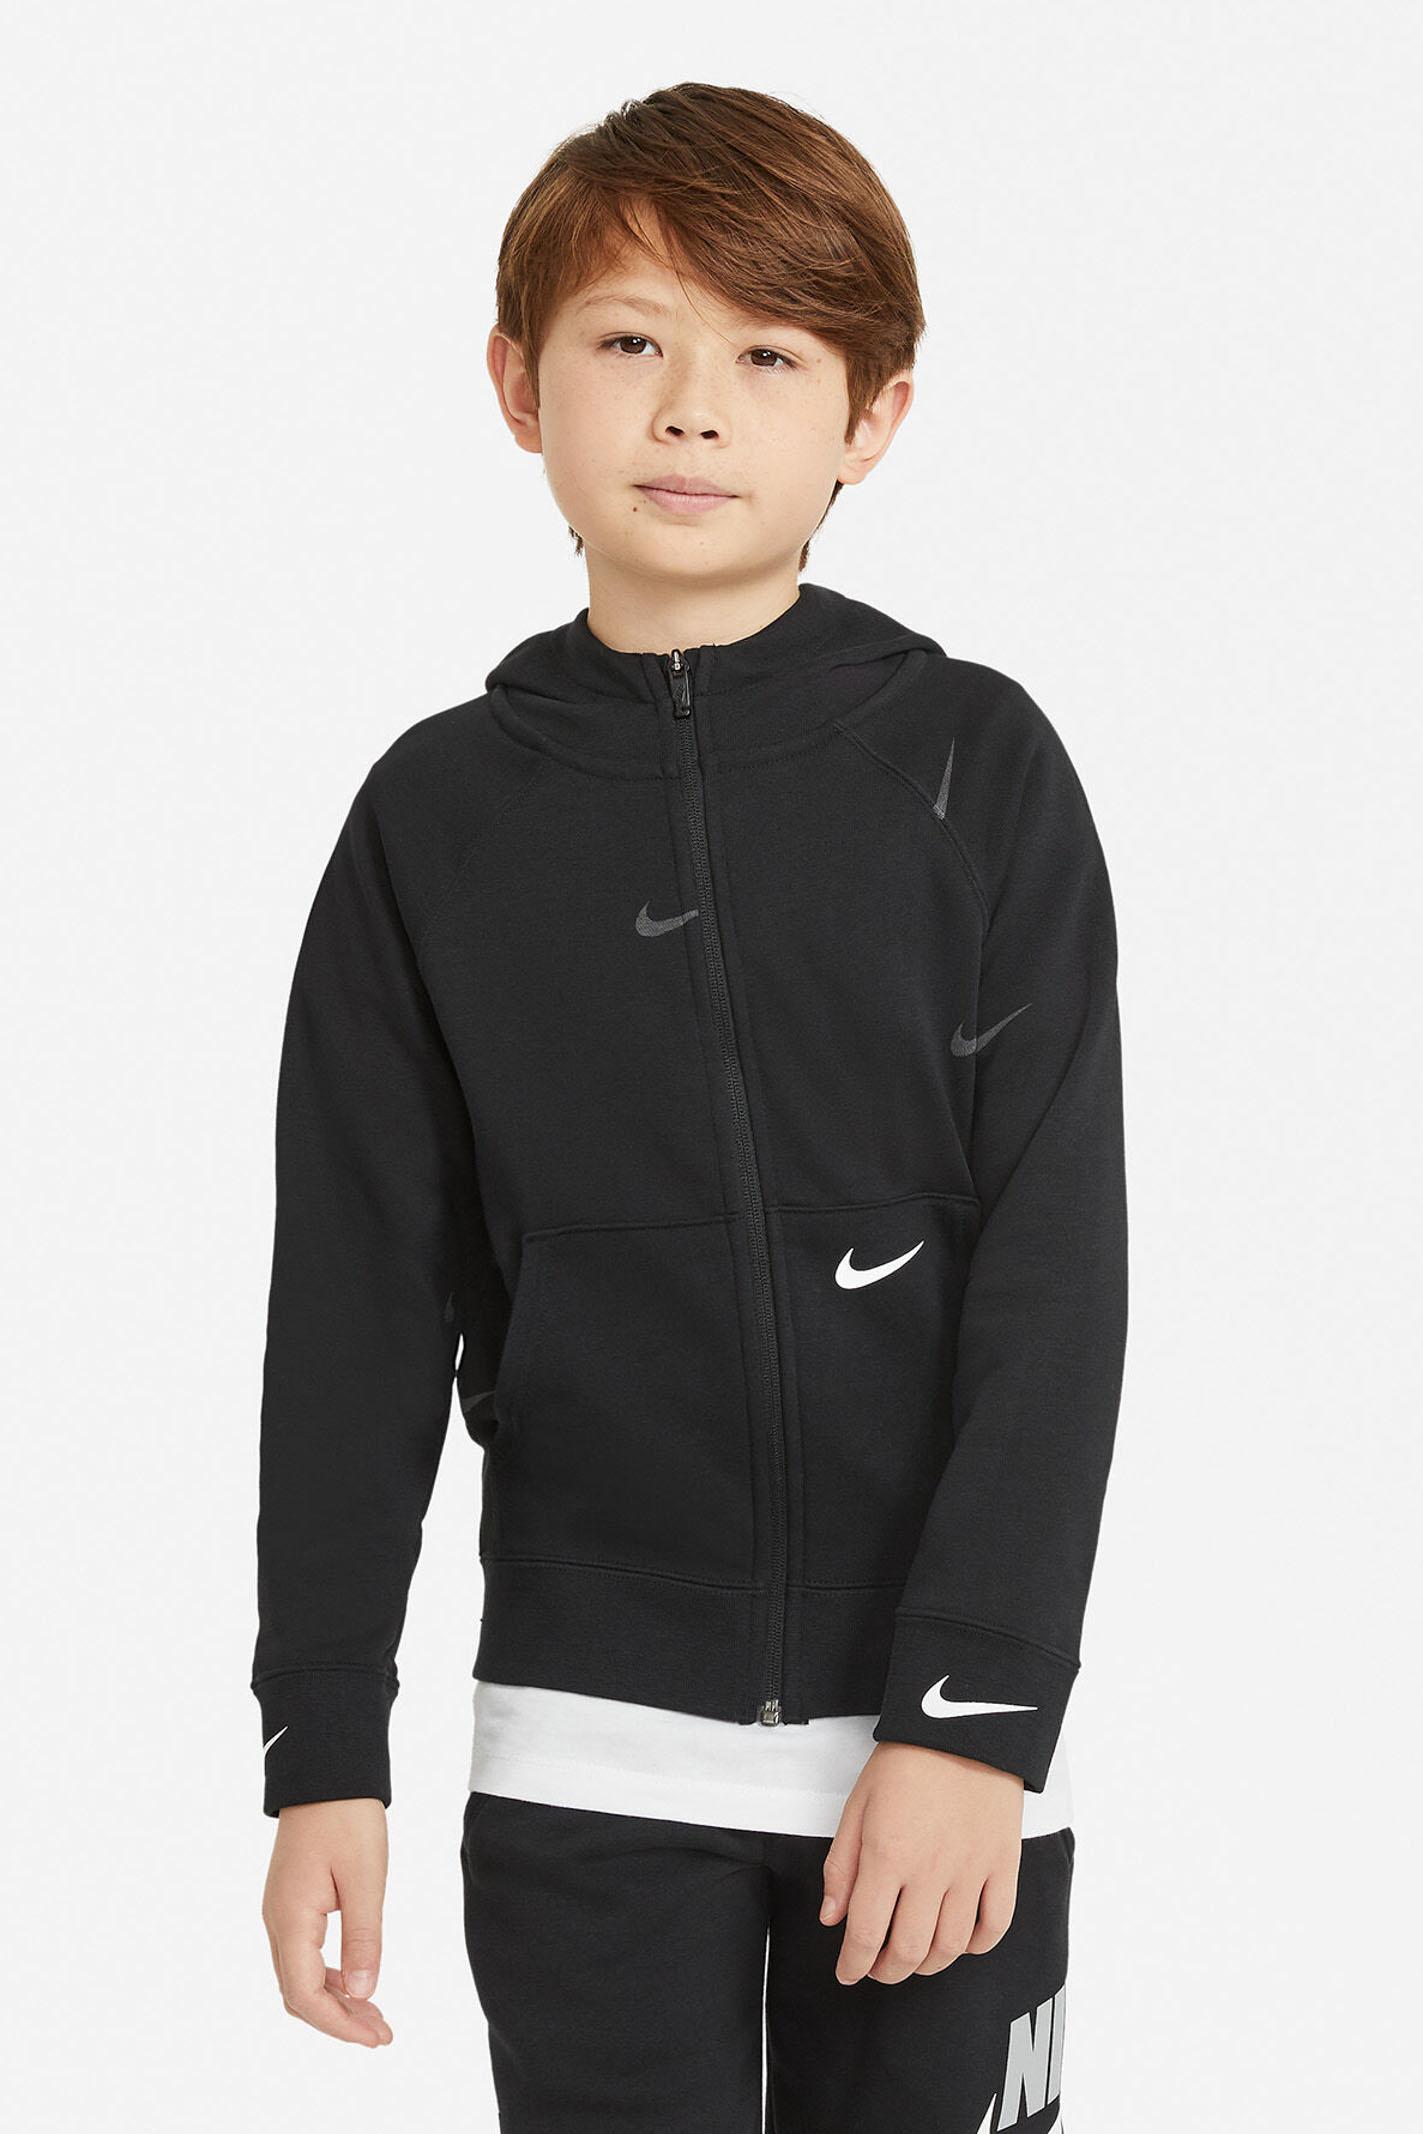 Black hoodie with front zip. Baby model. Brand: Nike NIKE | Sweatshirt | DA0768010